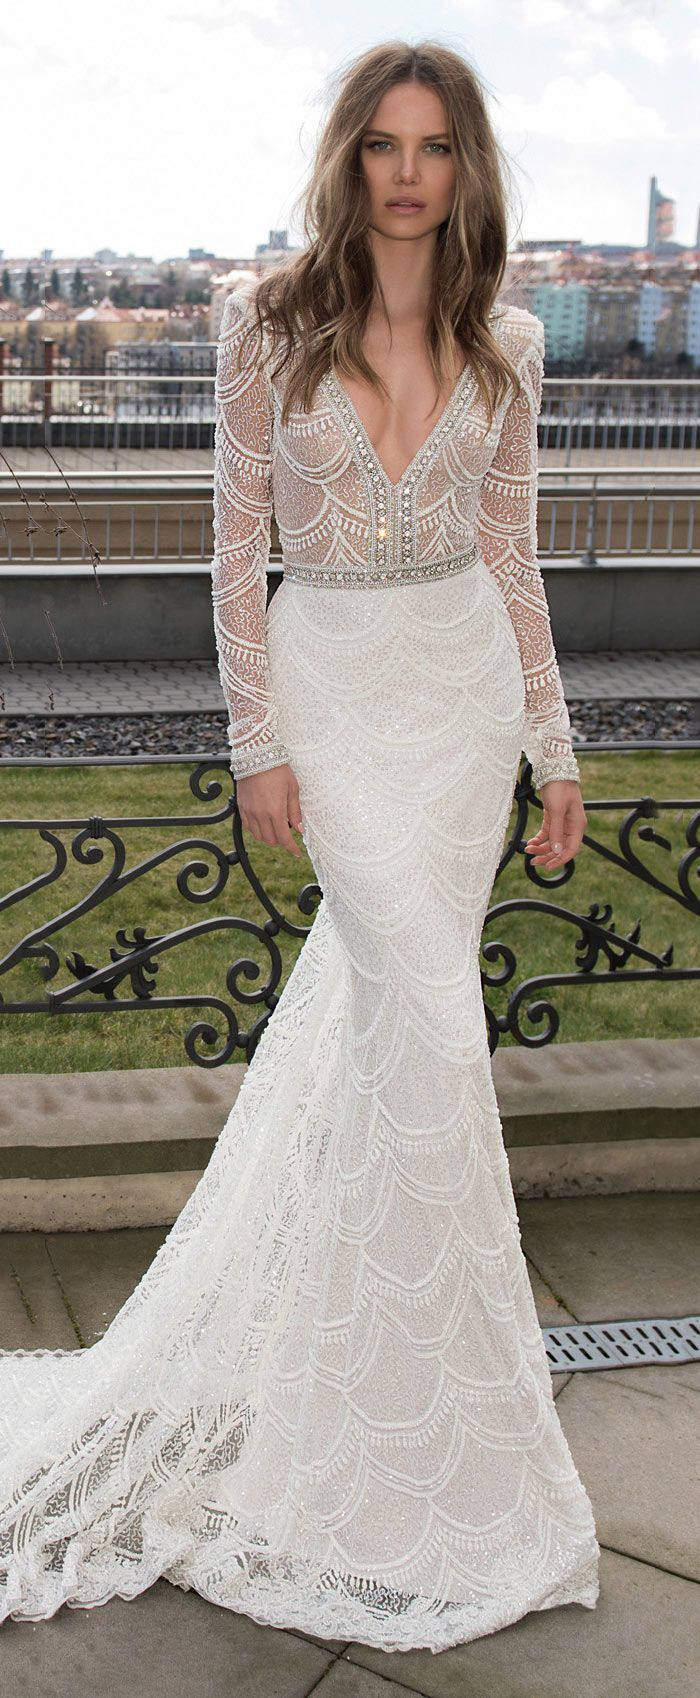 cbc228217 50 Vestidos de Noiva Incríveis | Vestidos | Wedding dress sleeves ...